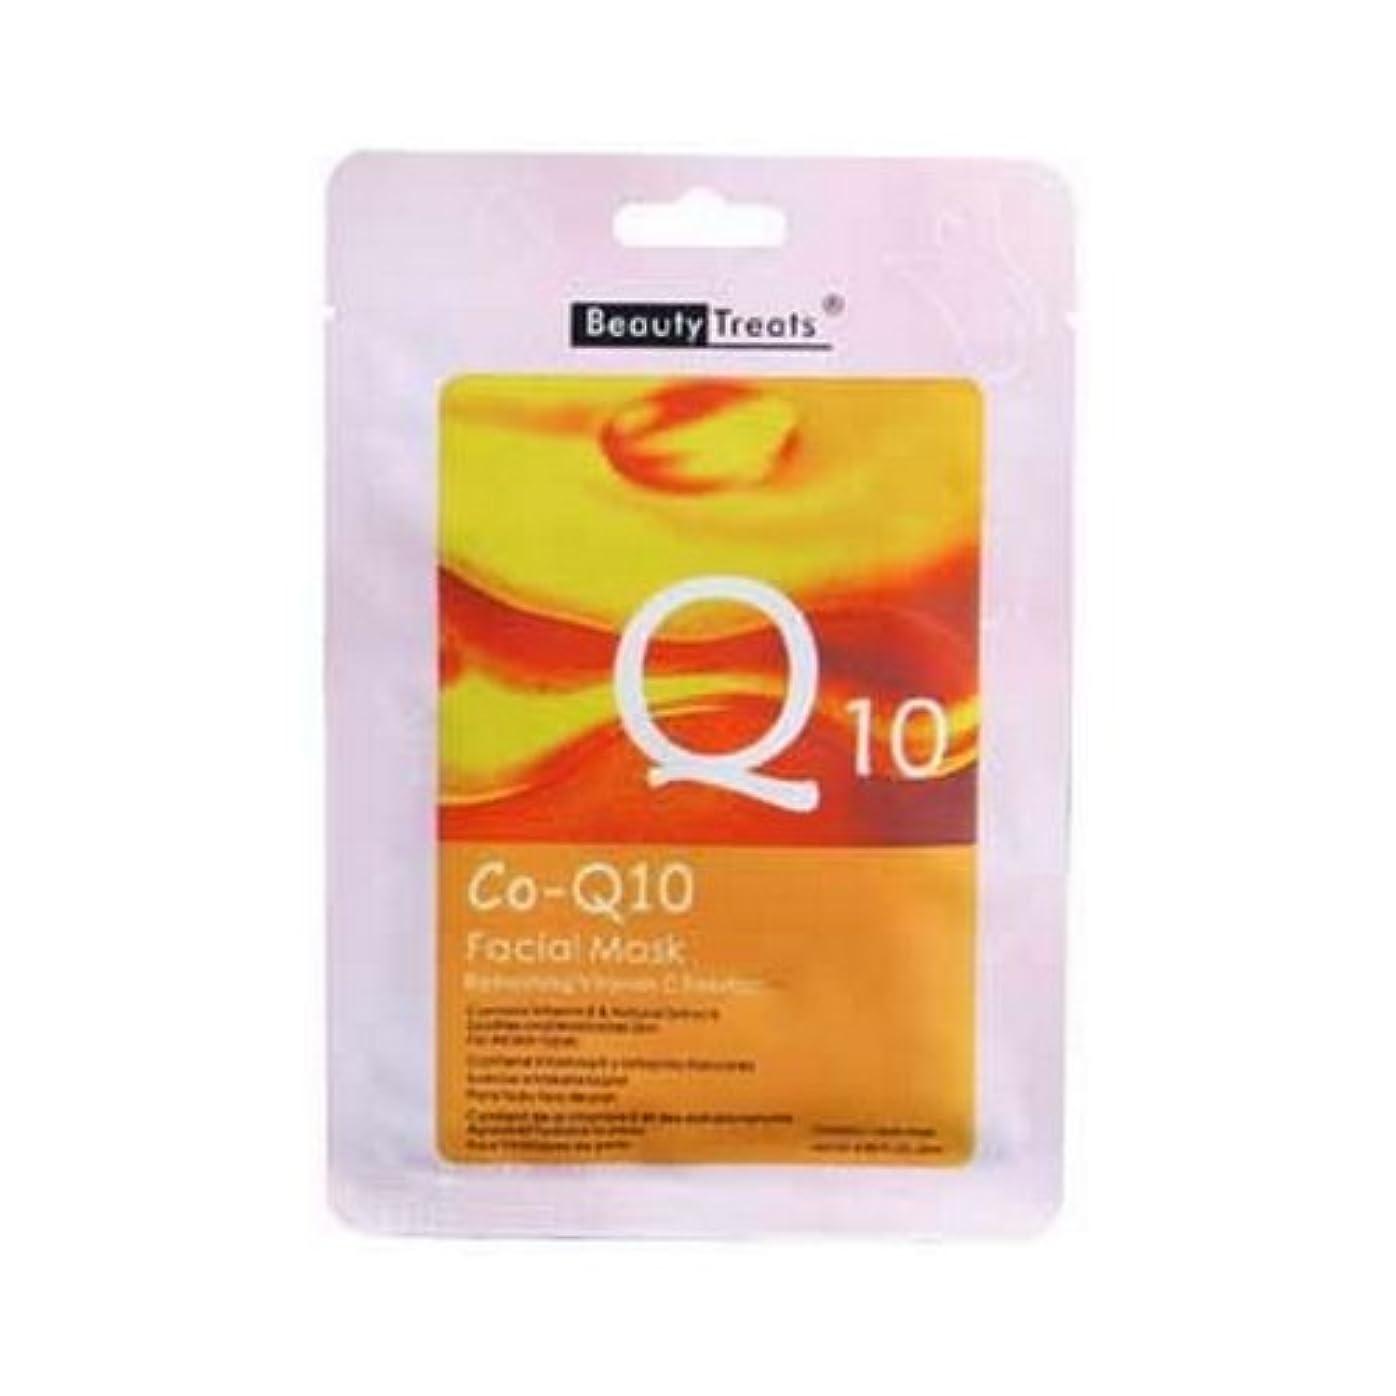 (6 Pack) BEAUTY TREATS Facial Mask Refreshing Vitamin C Solution - Co-Q10 (並行輸入品)